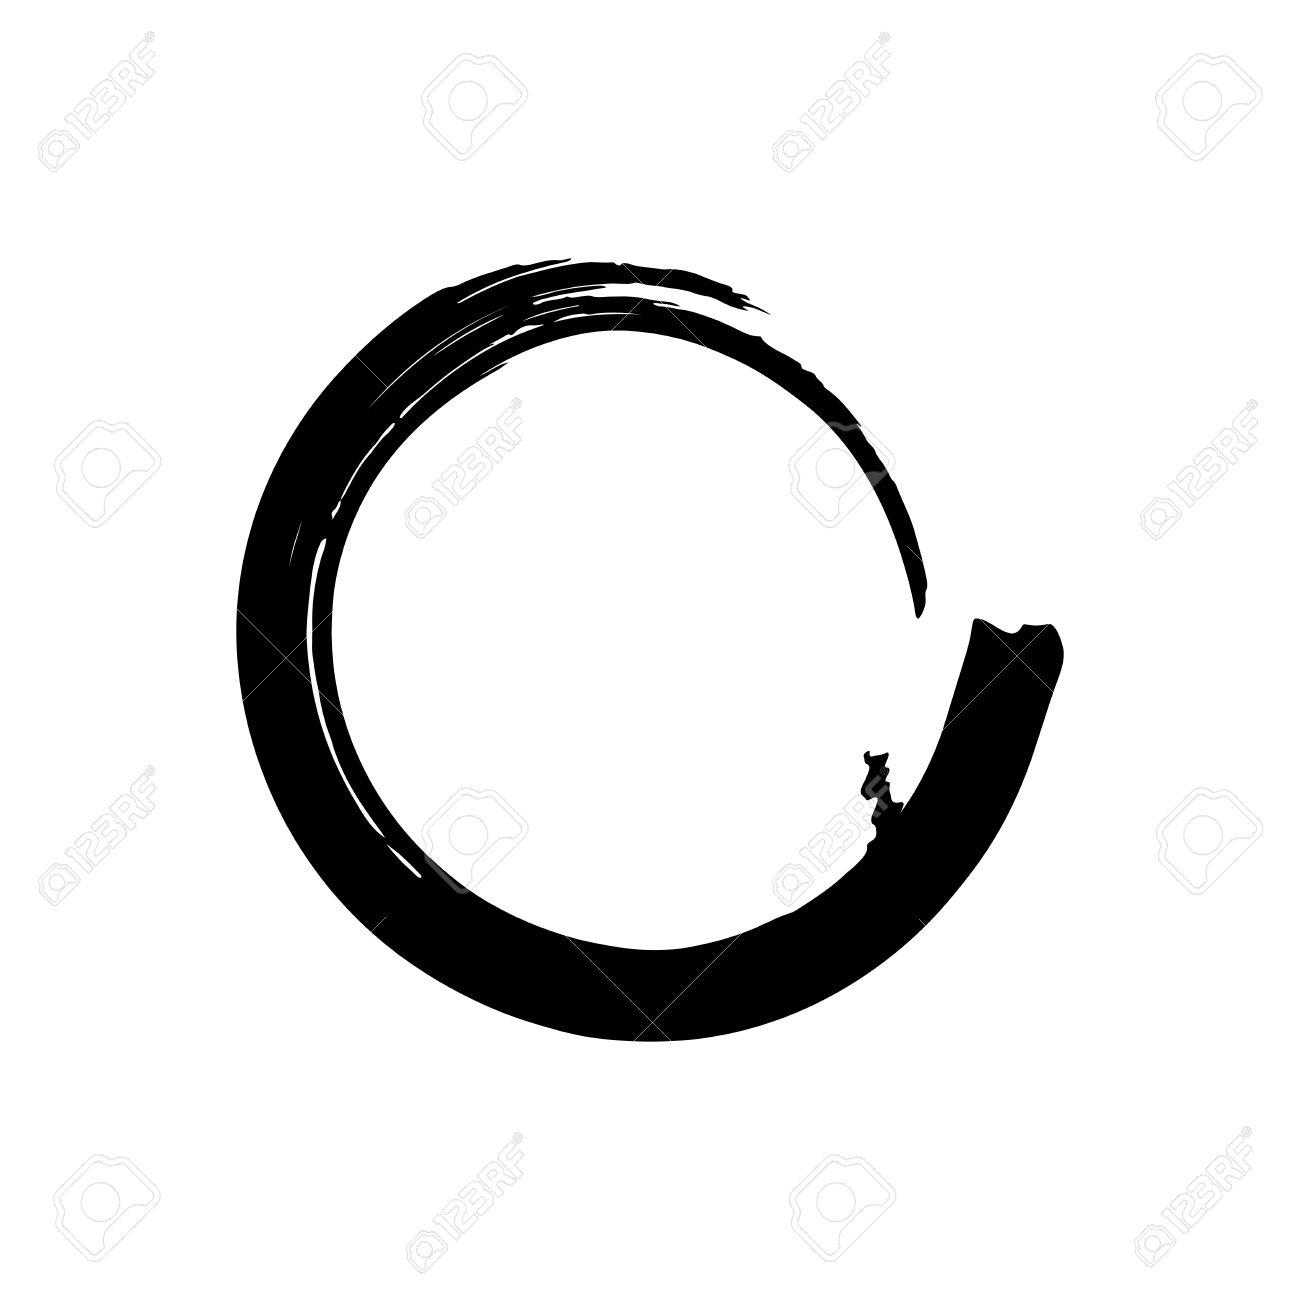 circle grunge ink spot vector background circle vector ink rh 123rf com grunge vector background illustrator black grunge vector background